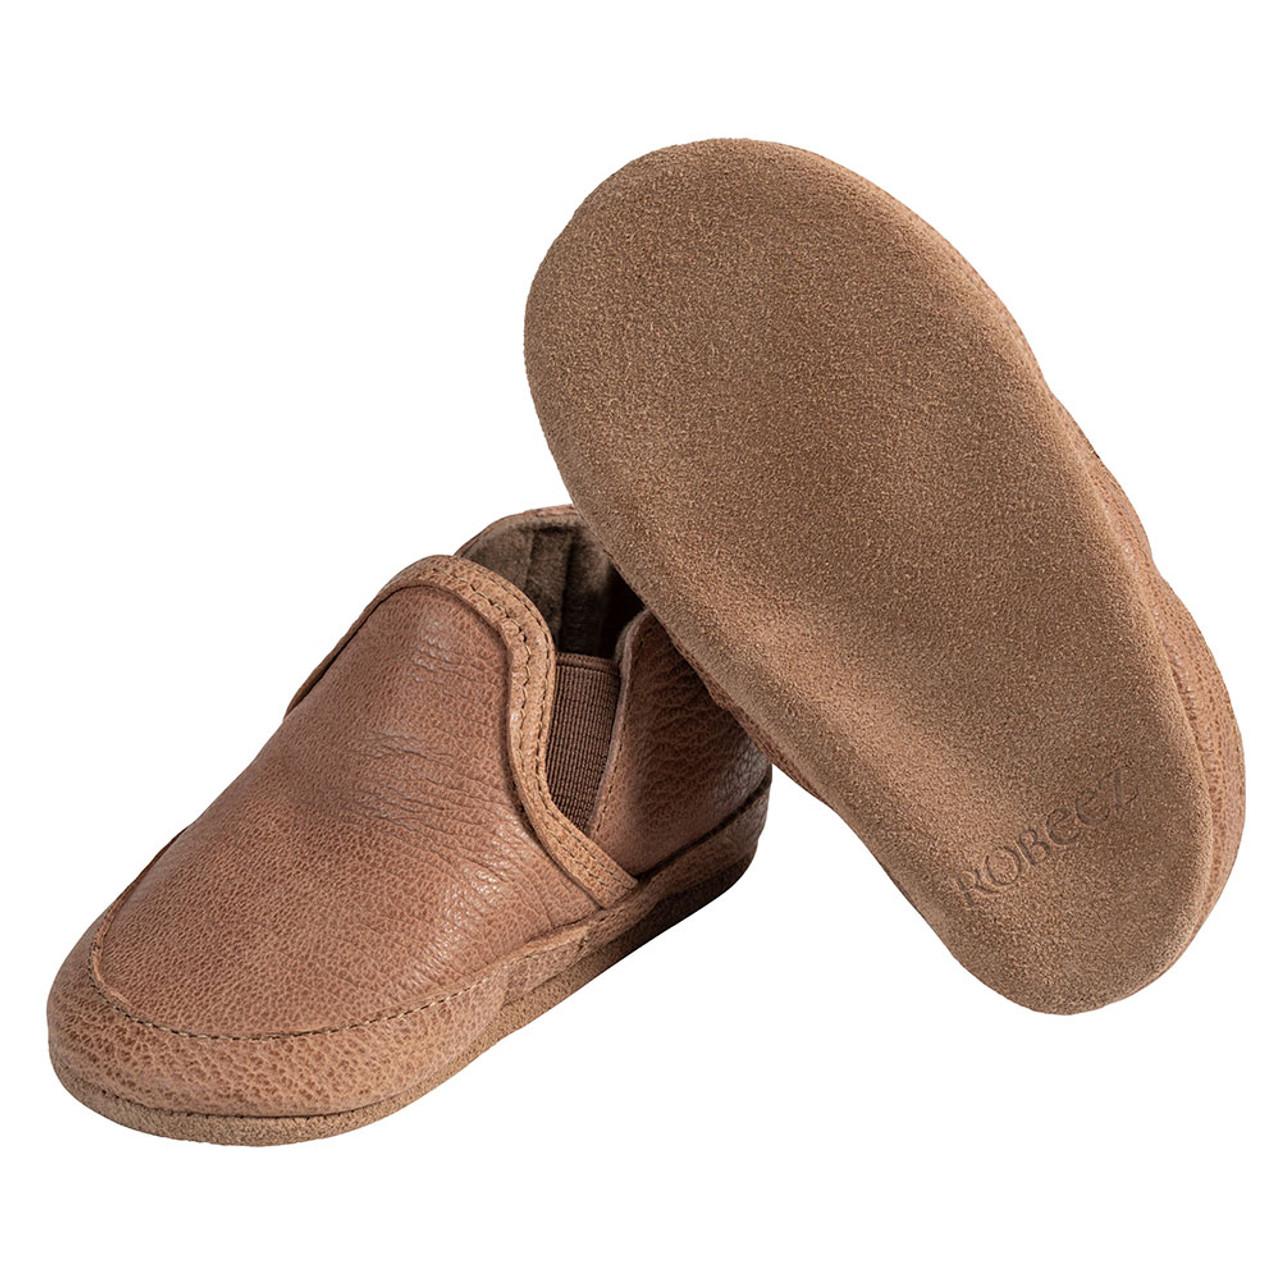 Camel Liam | Soft Soles | Baby Shoes